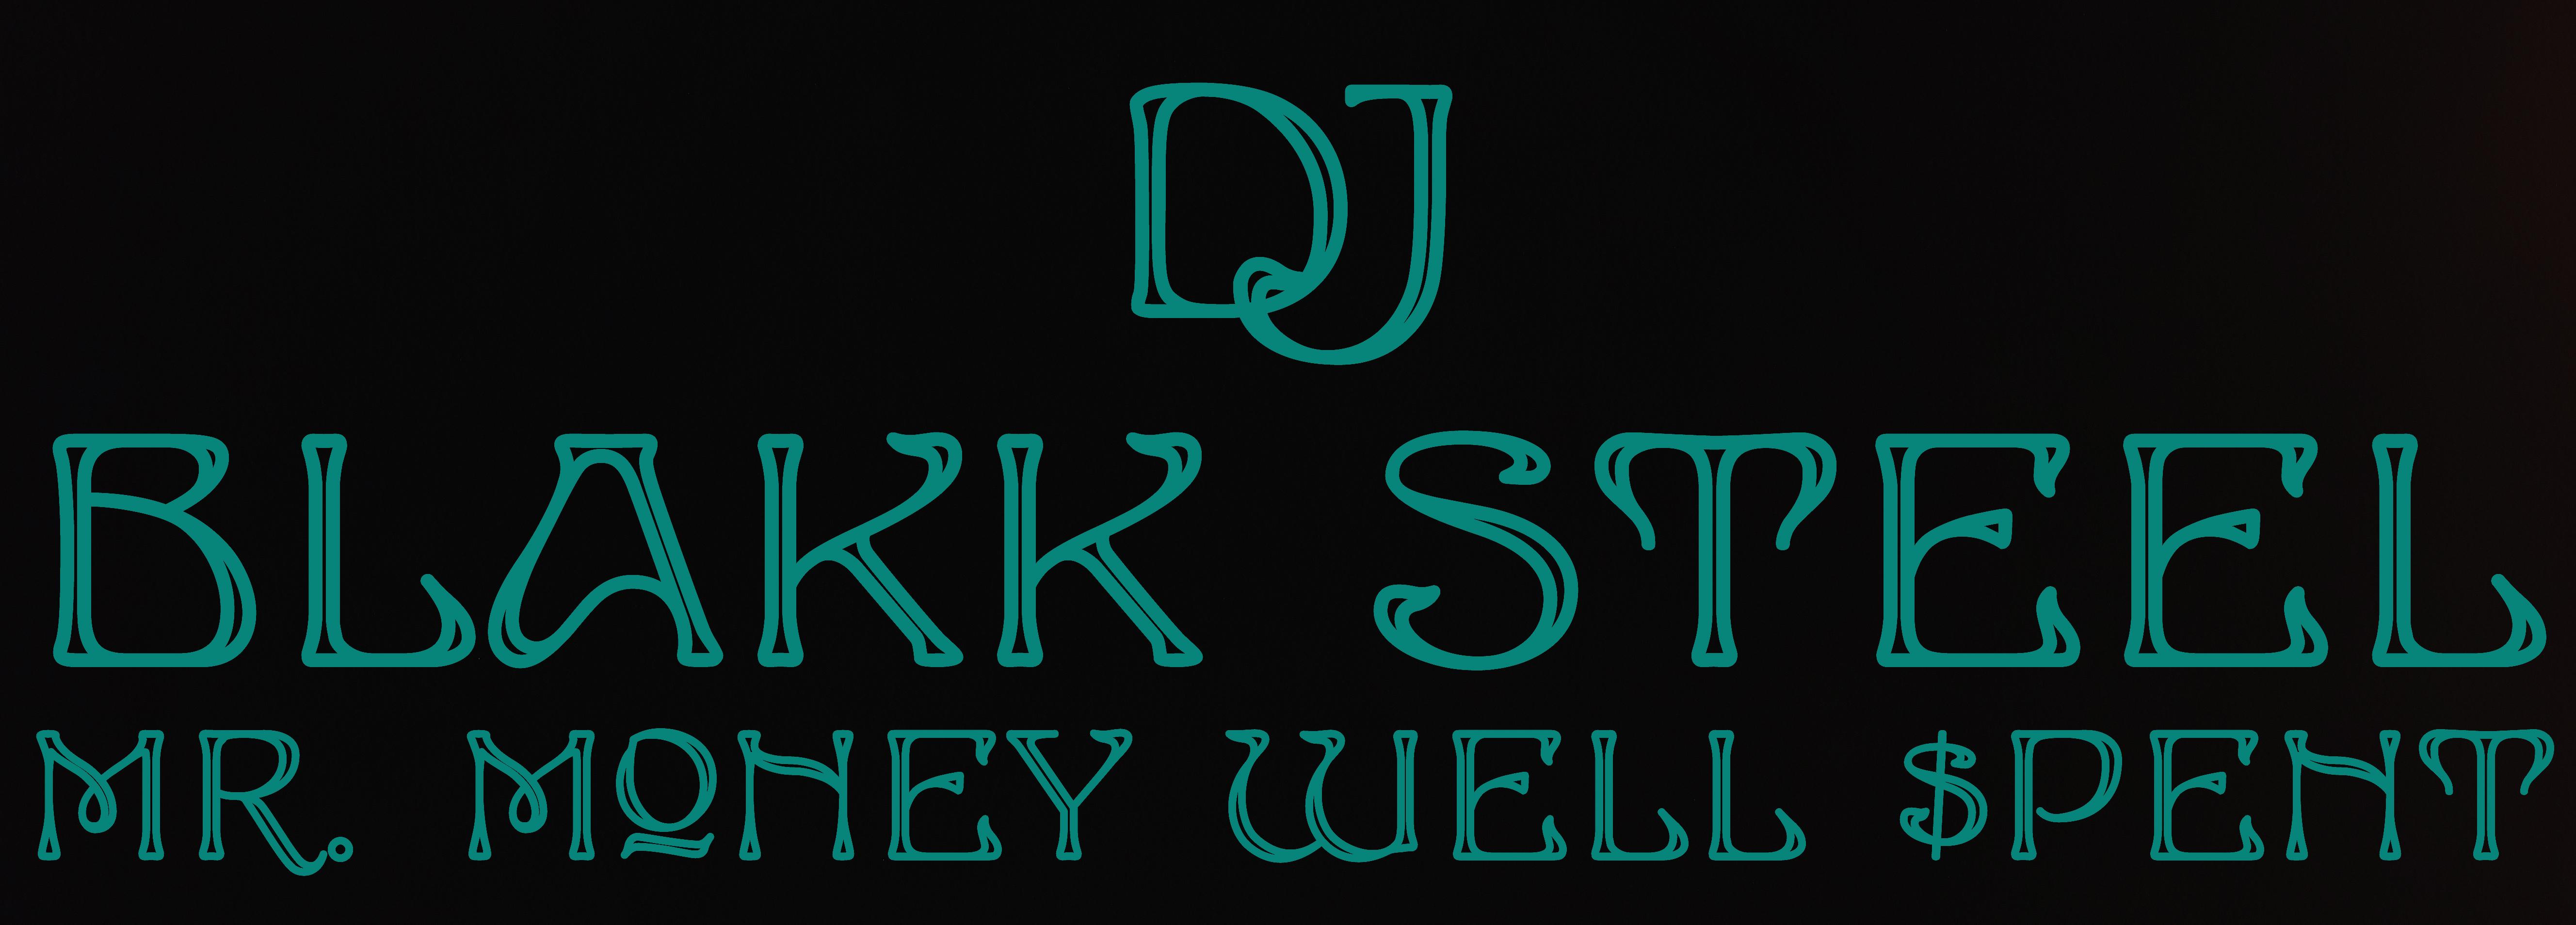 Blakk Steel